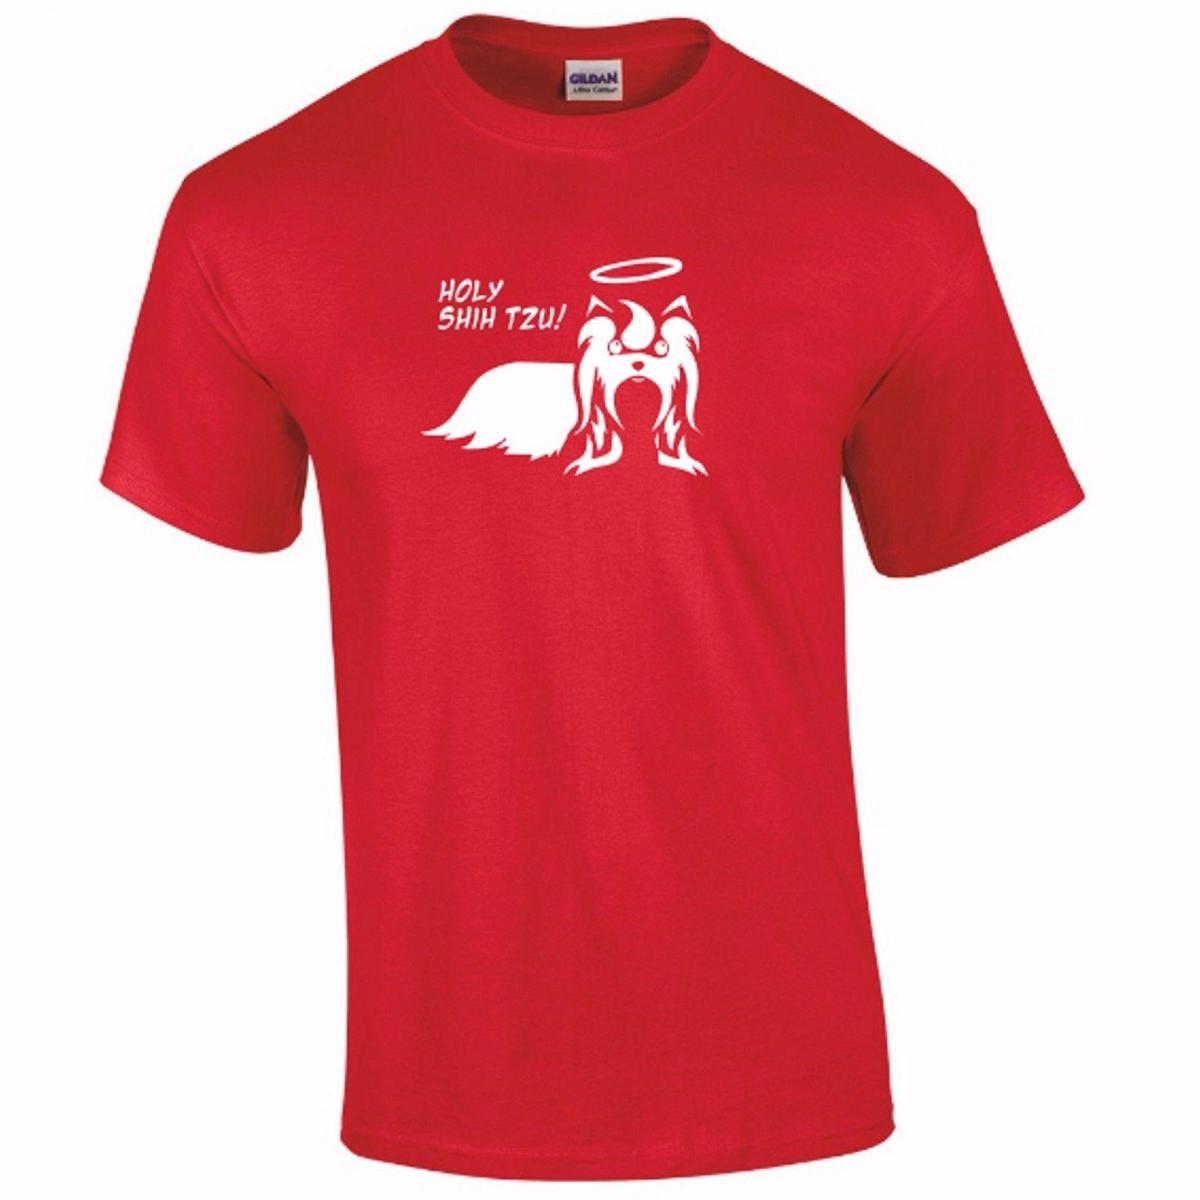 77999a11 T Shirts Crazy Dog | Top Mode Depot